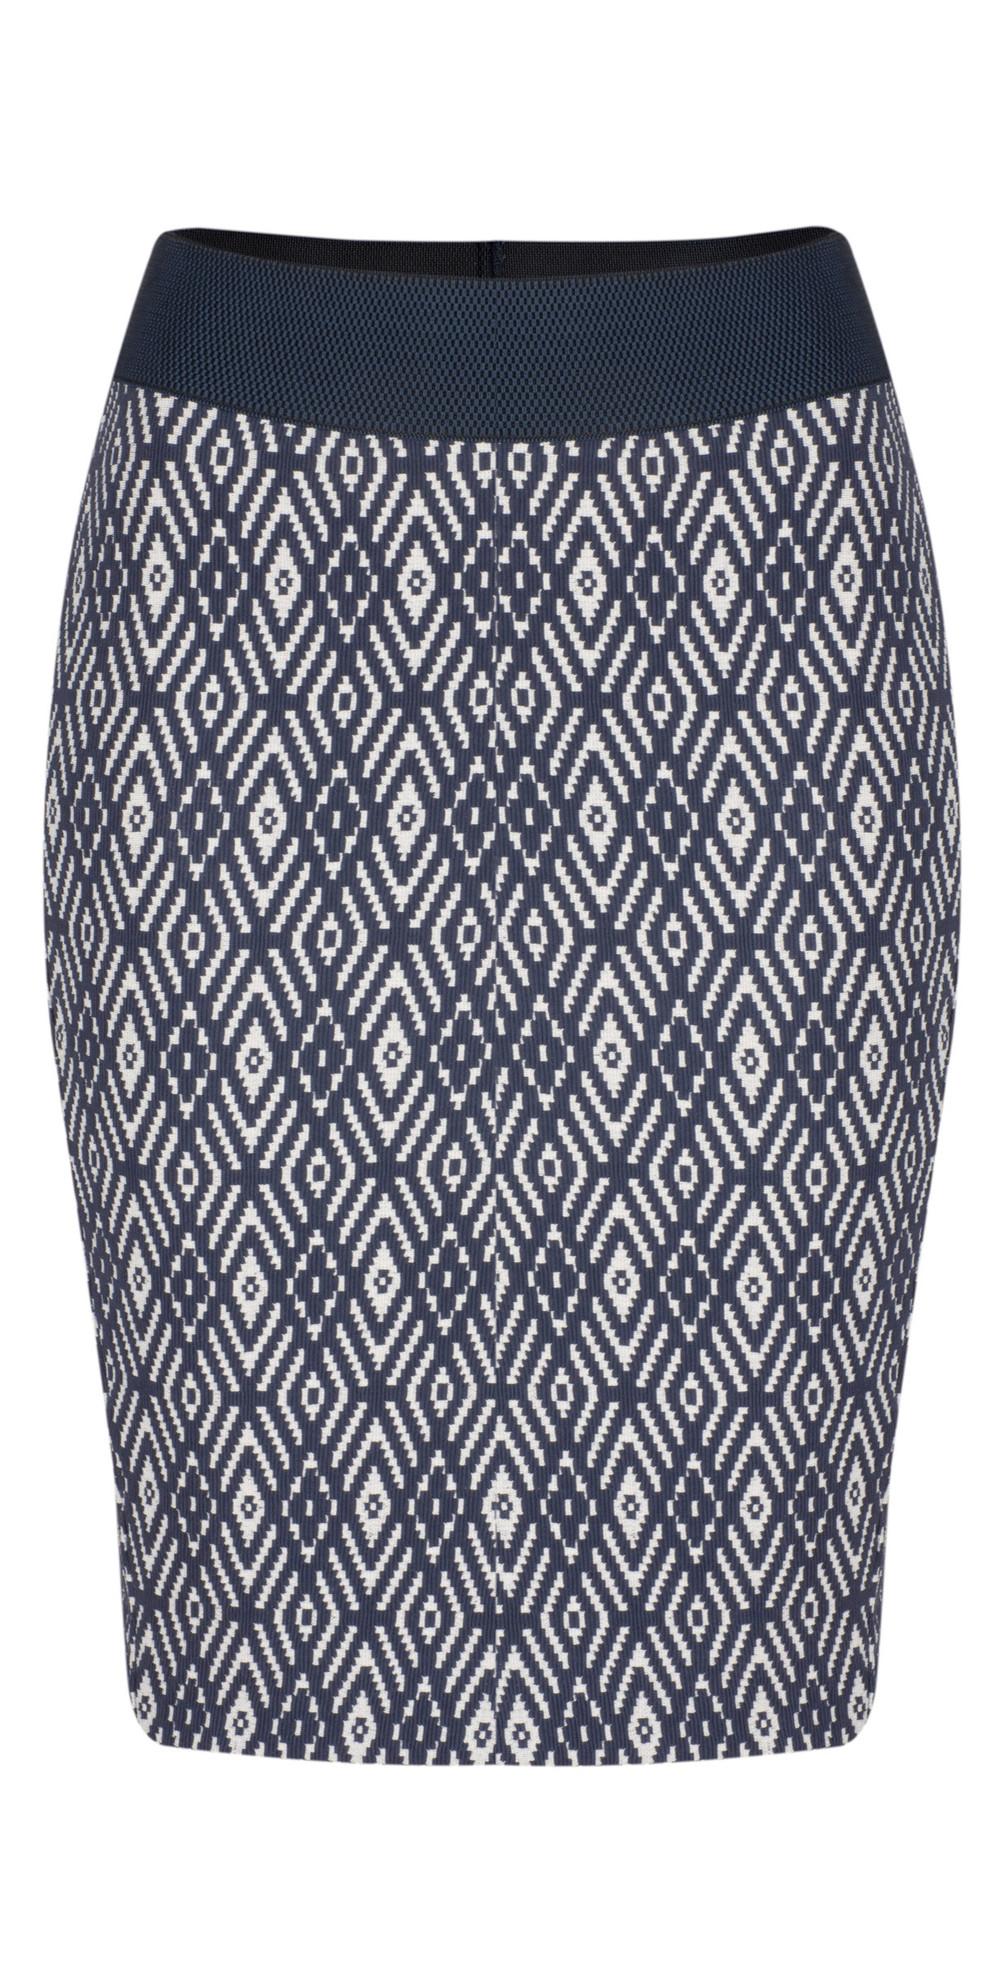 916e3d491b0b2f Sandwich Clothing Diamond Jacquard Stretch Skirt in Mood Indigo